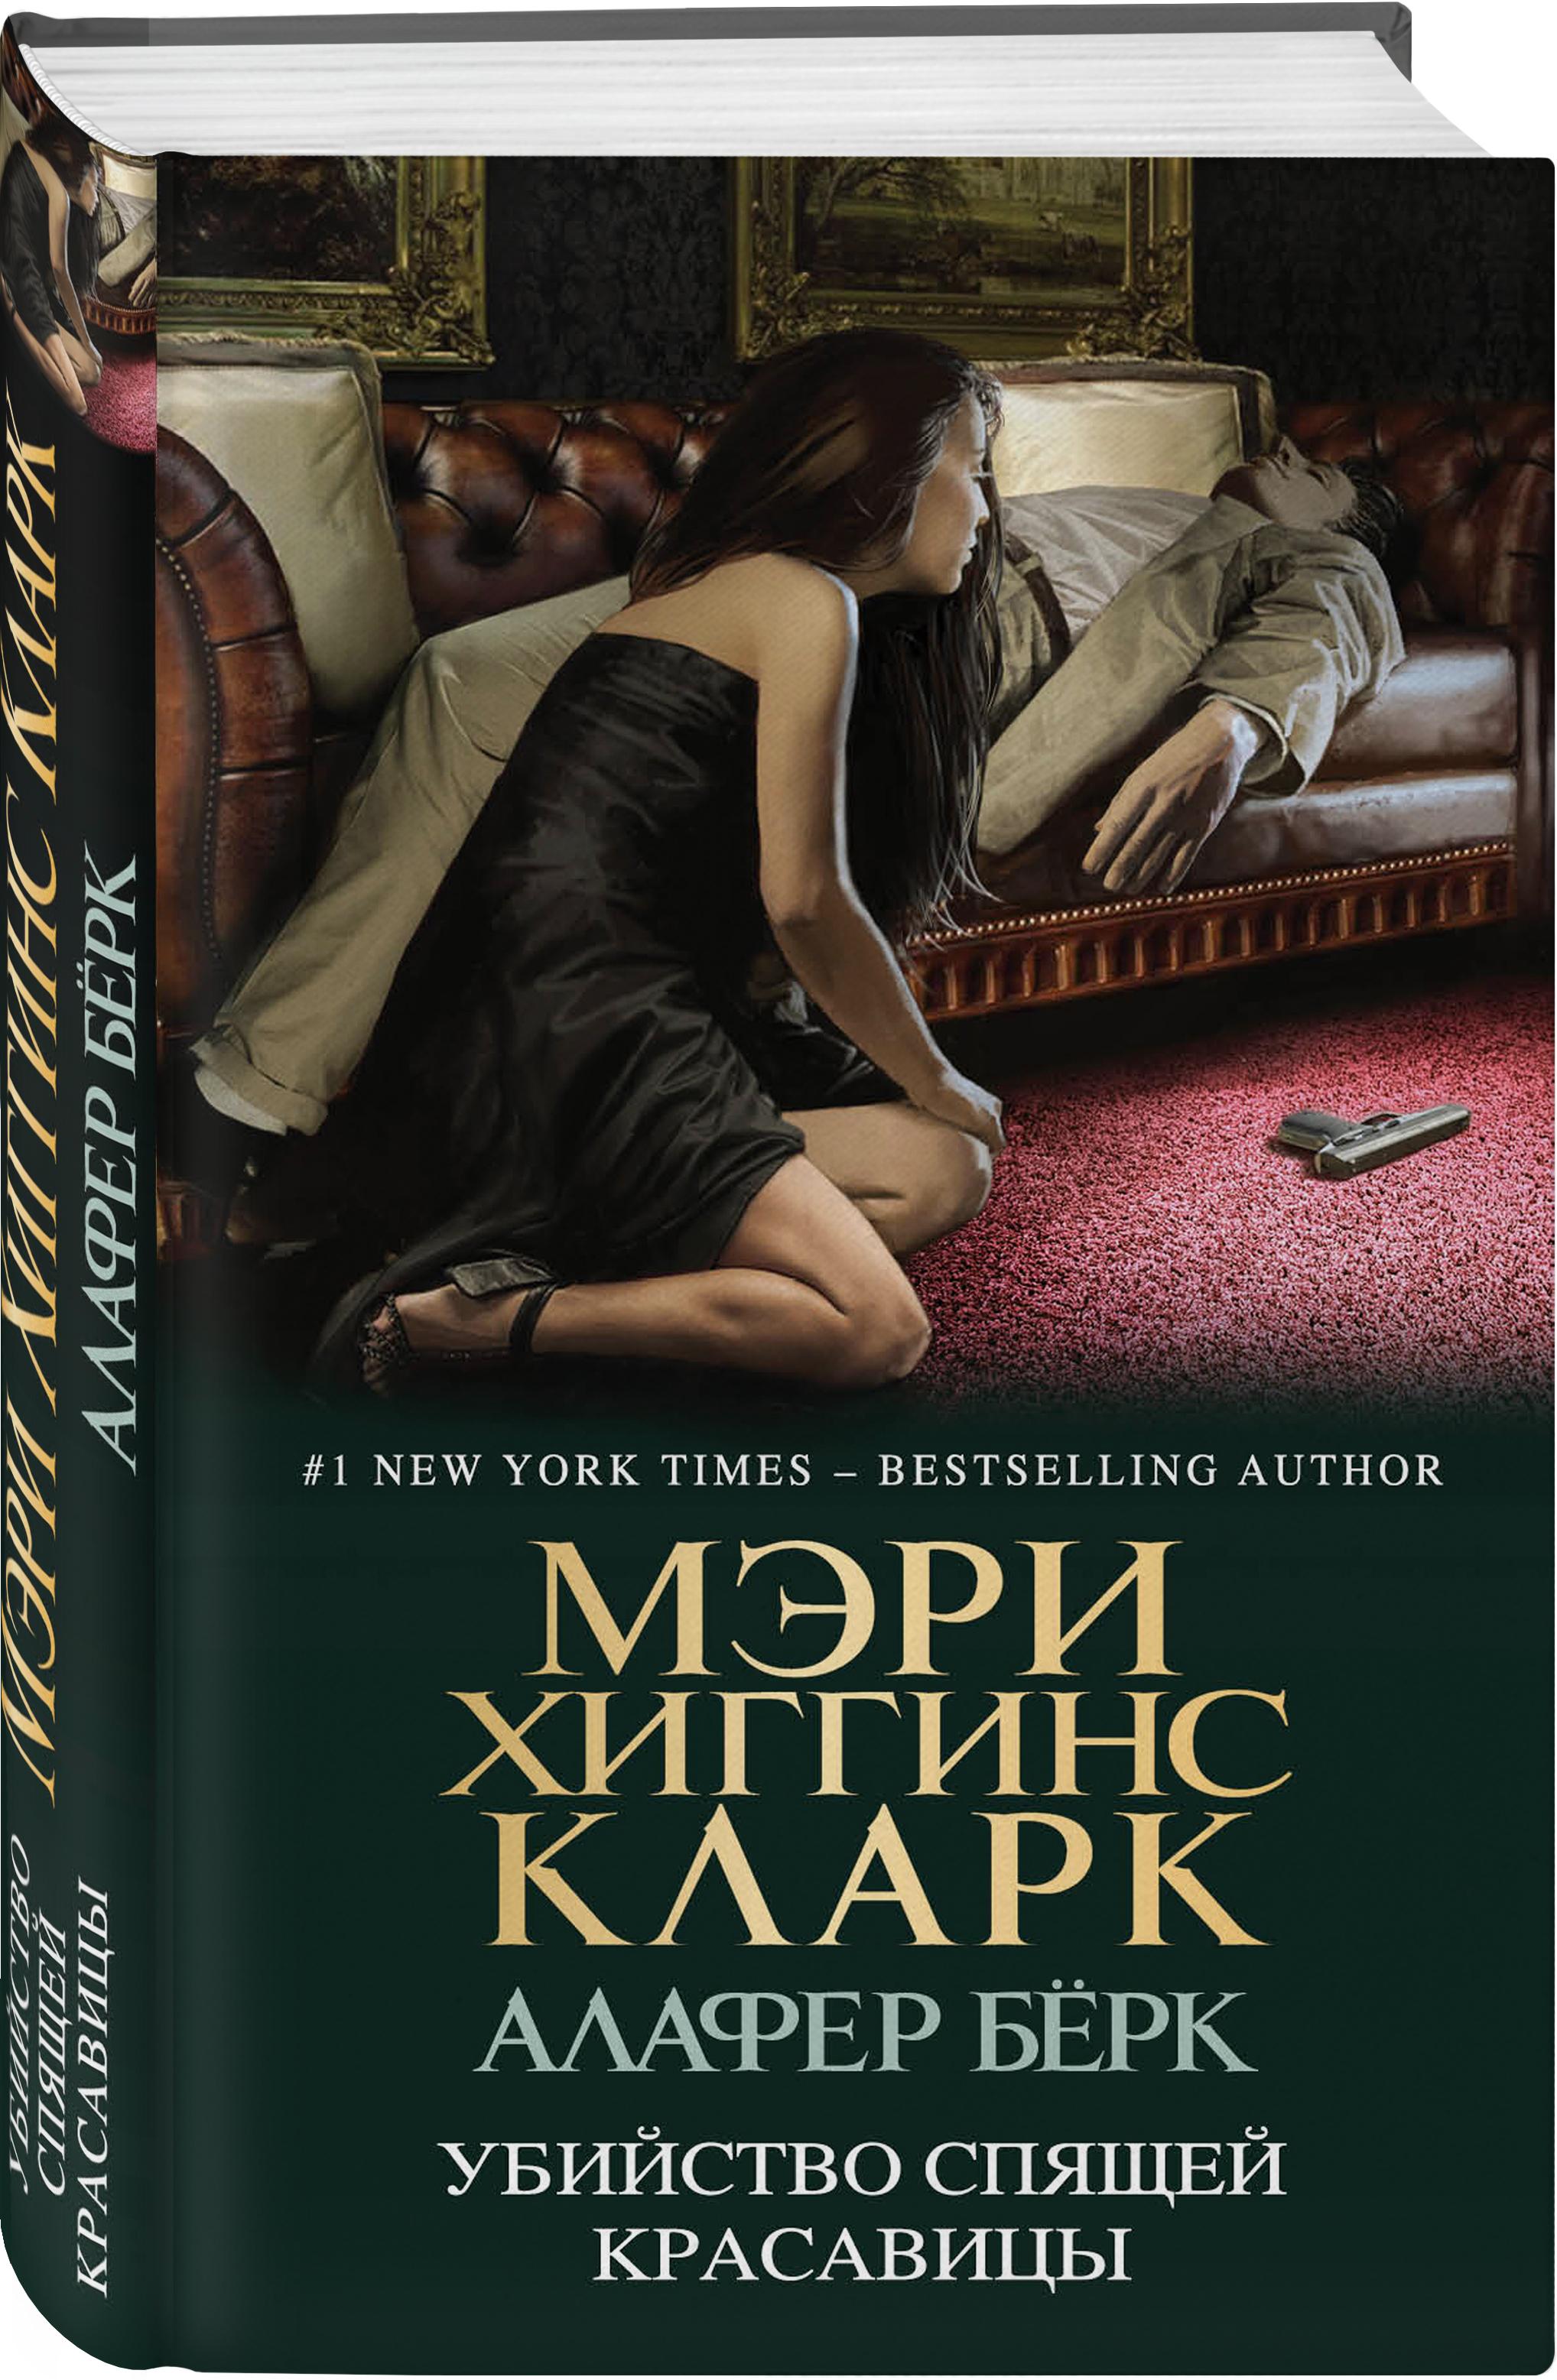 Хиггинс Кларк М., Бёрк А. Убийство Спящей Красавицы спящая красавица